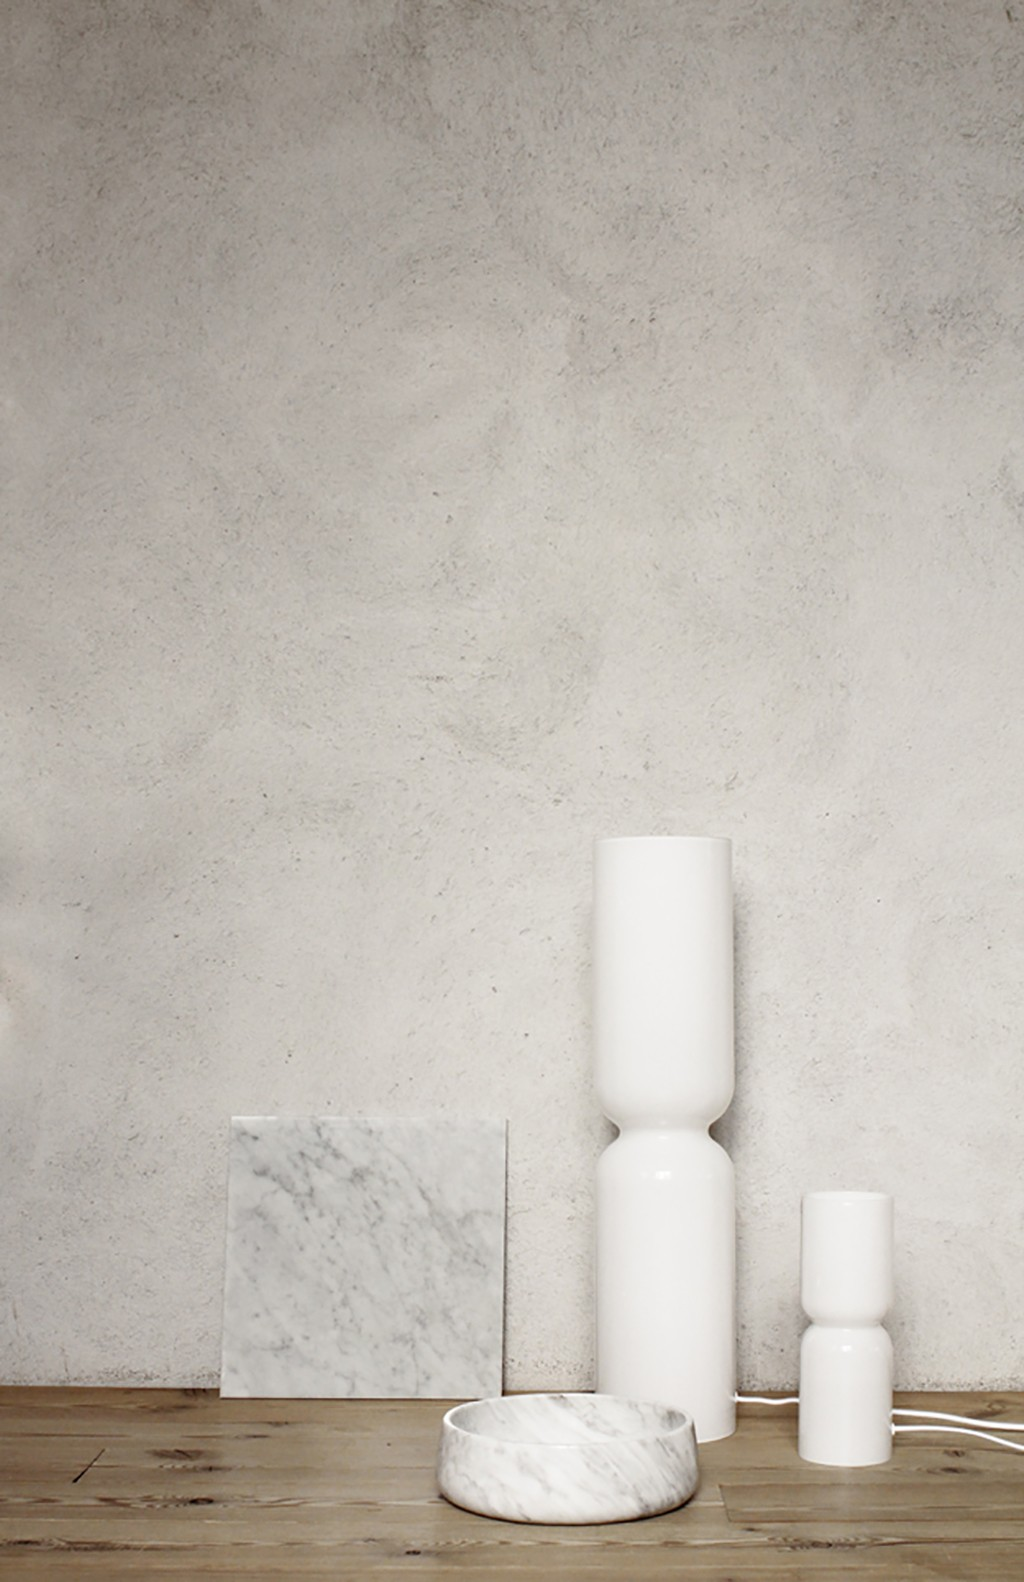 Blog collaboration with Iittala for Iittala by Susanna Vento